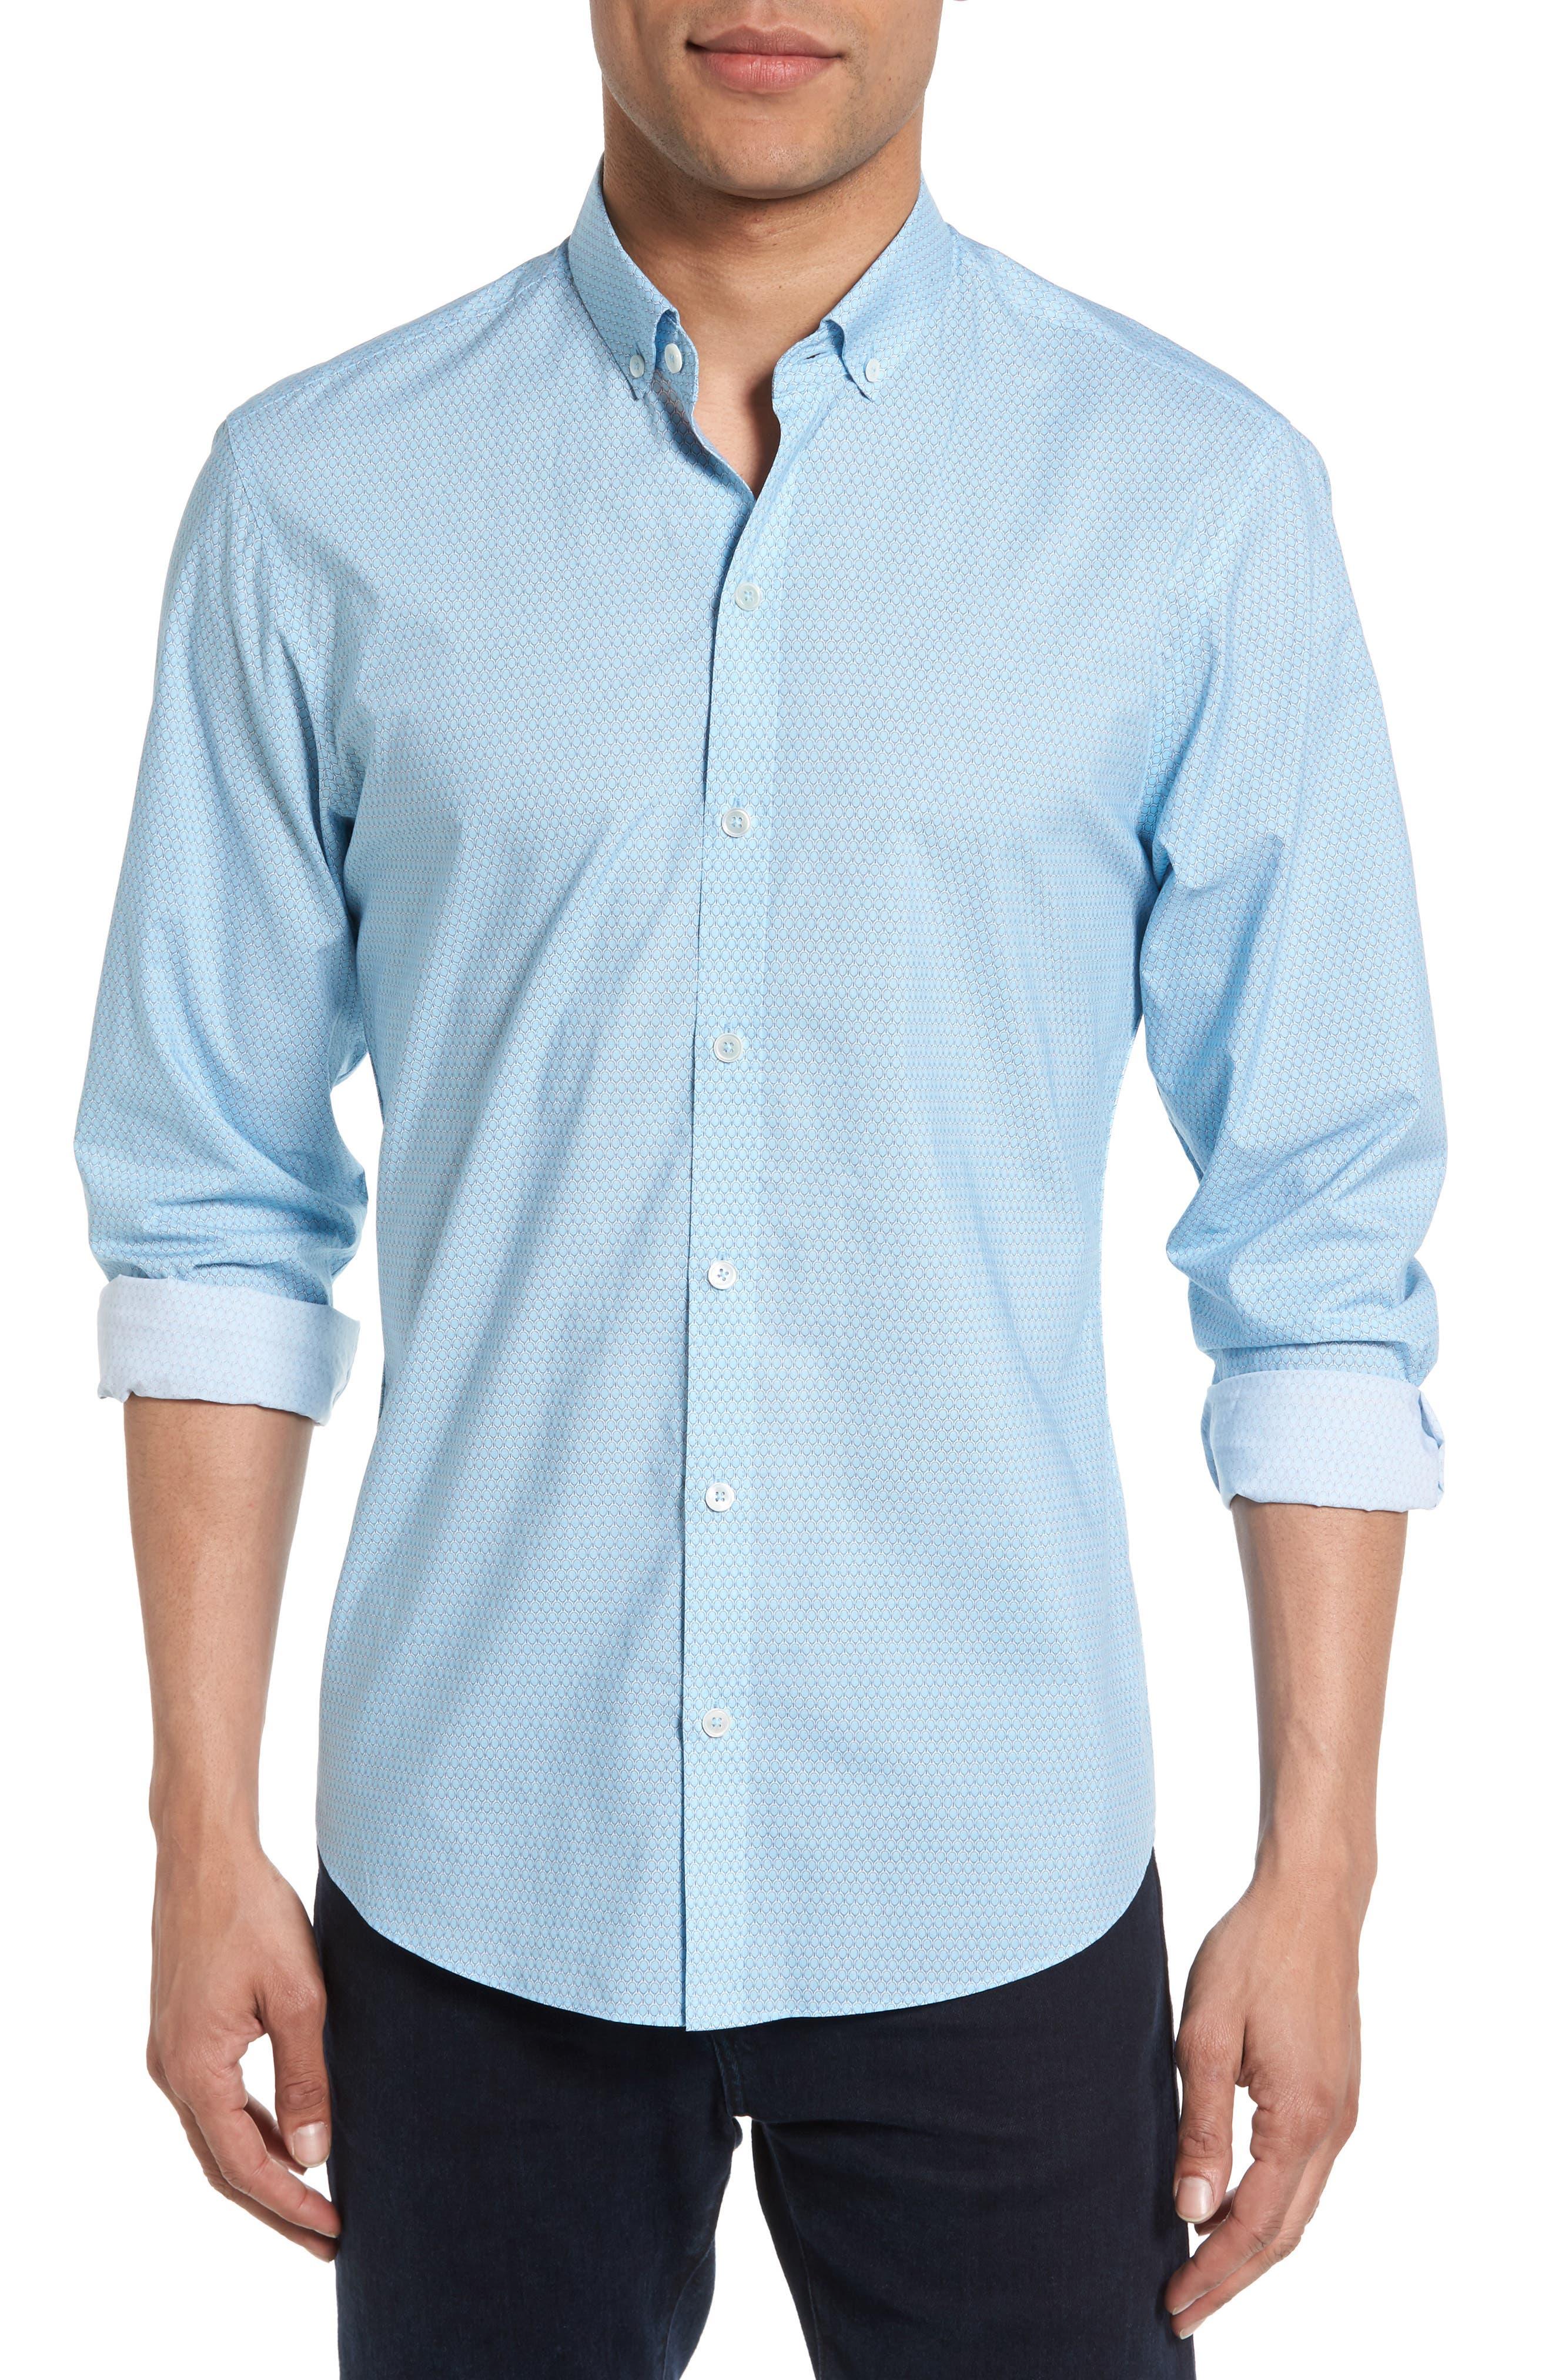 Dakotah Trim Fit Print Sport Shirt,                         Main,                         color, LIGHT BLUE